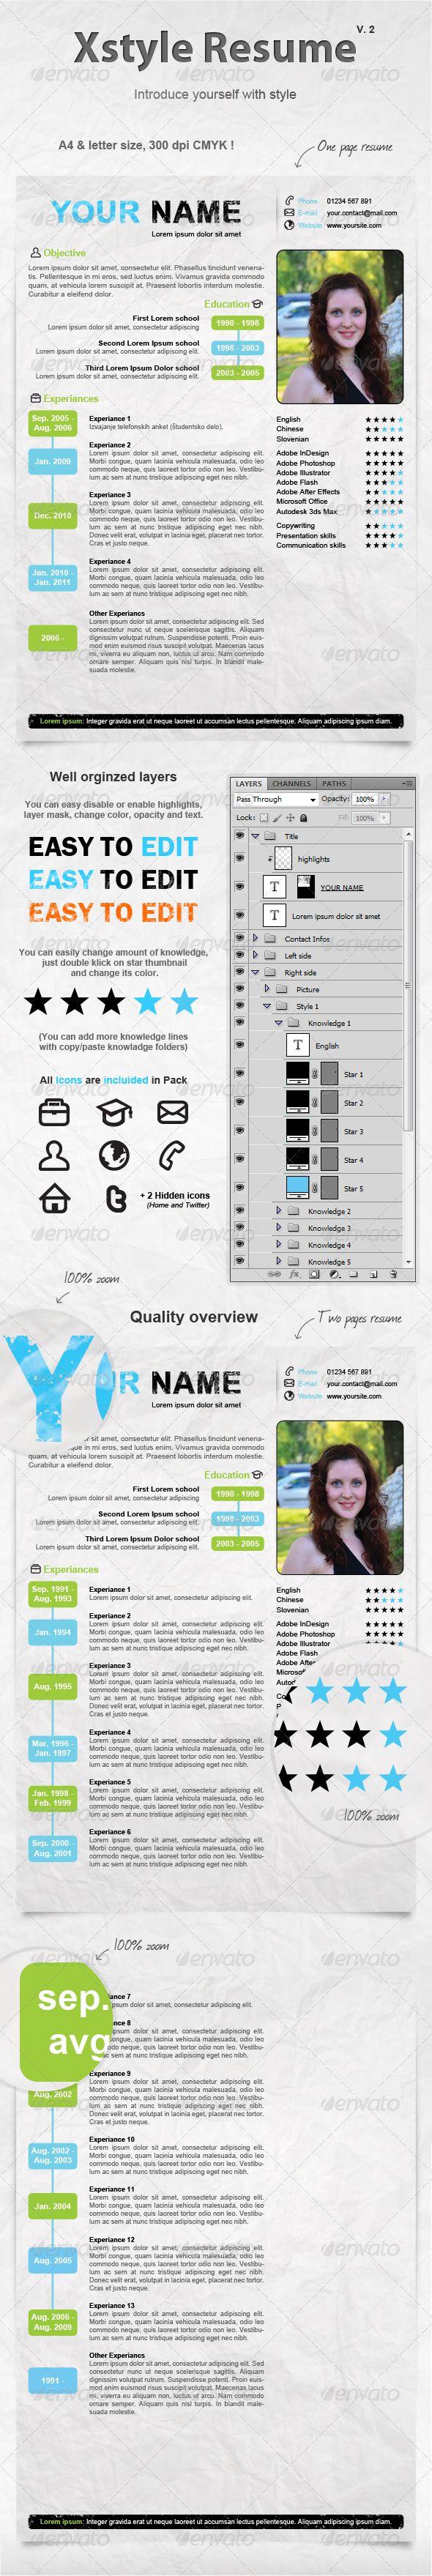 25 free creative resume templates - Artsy Resume Templates